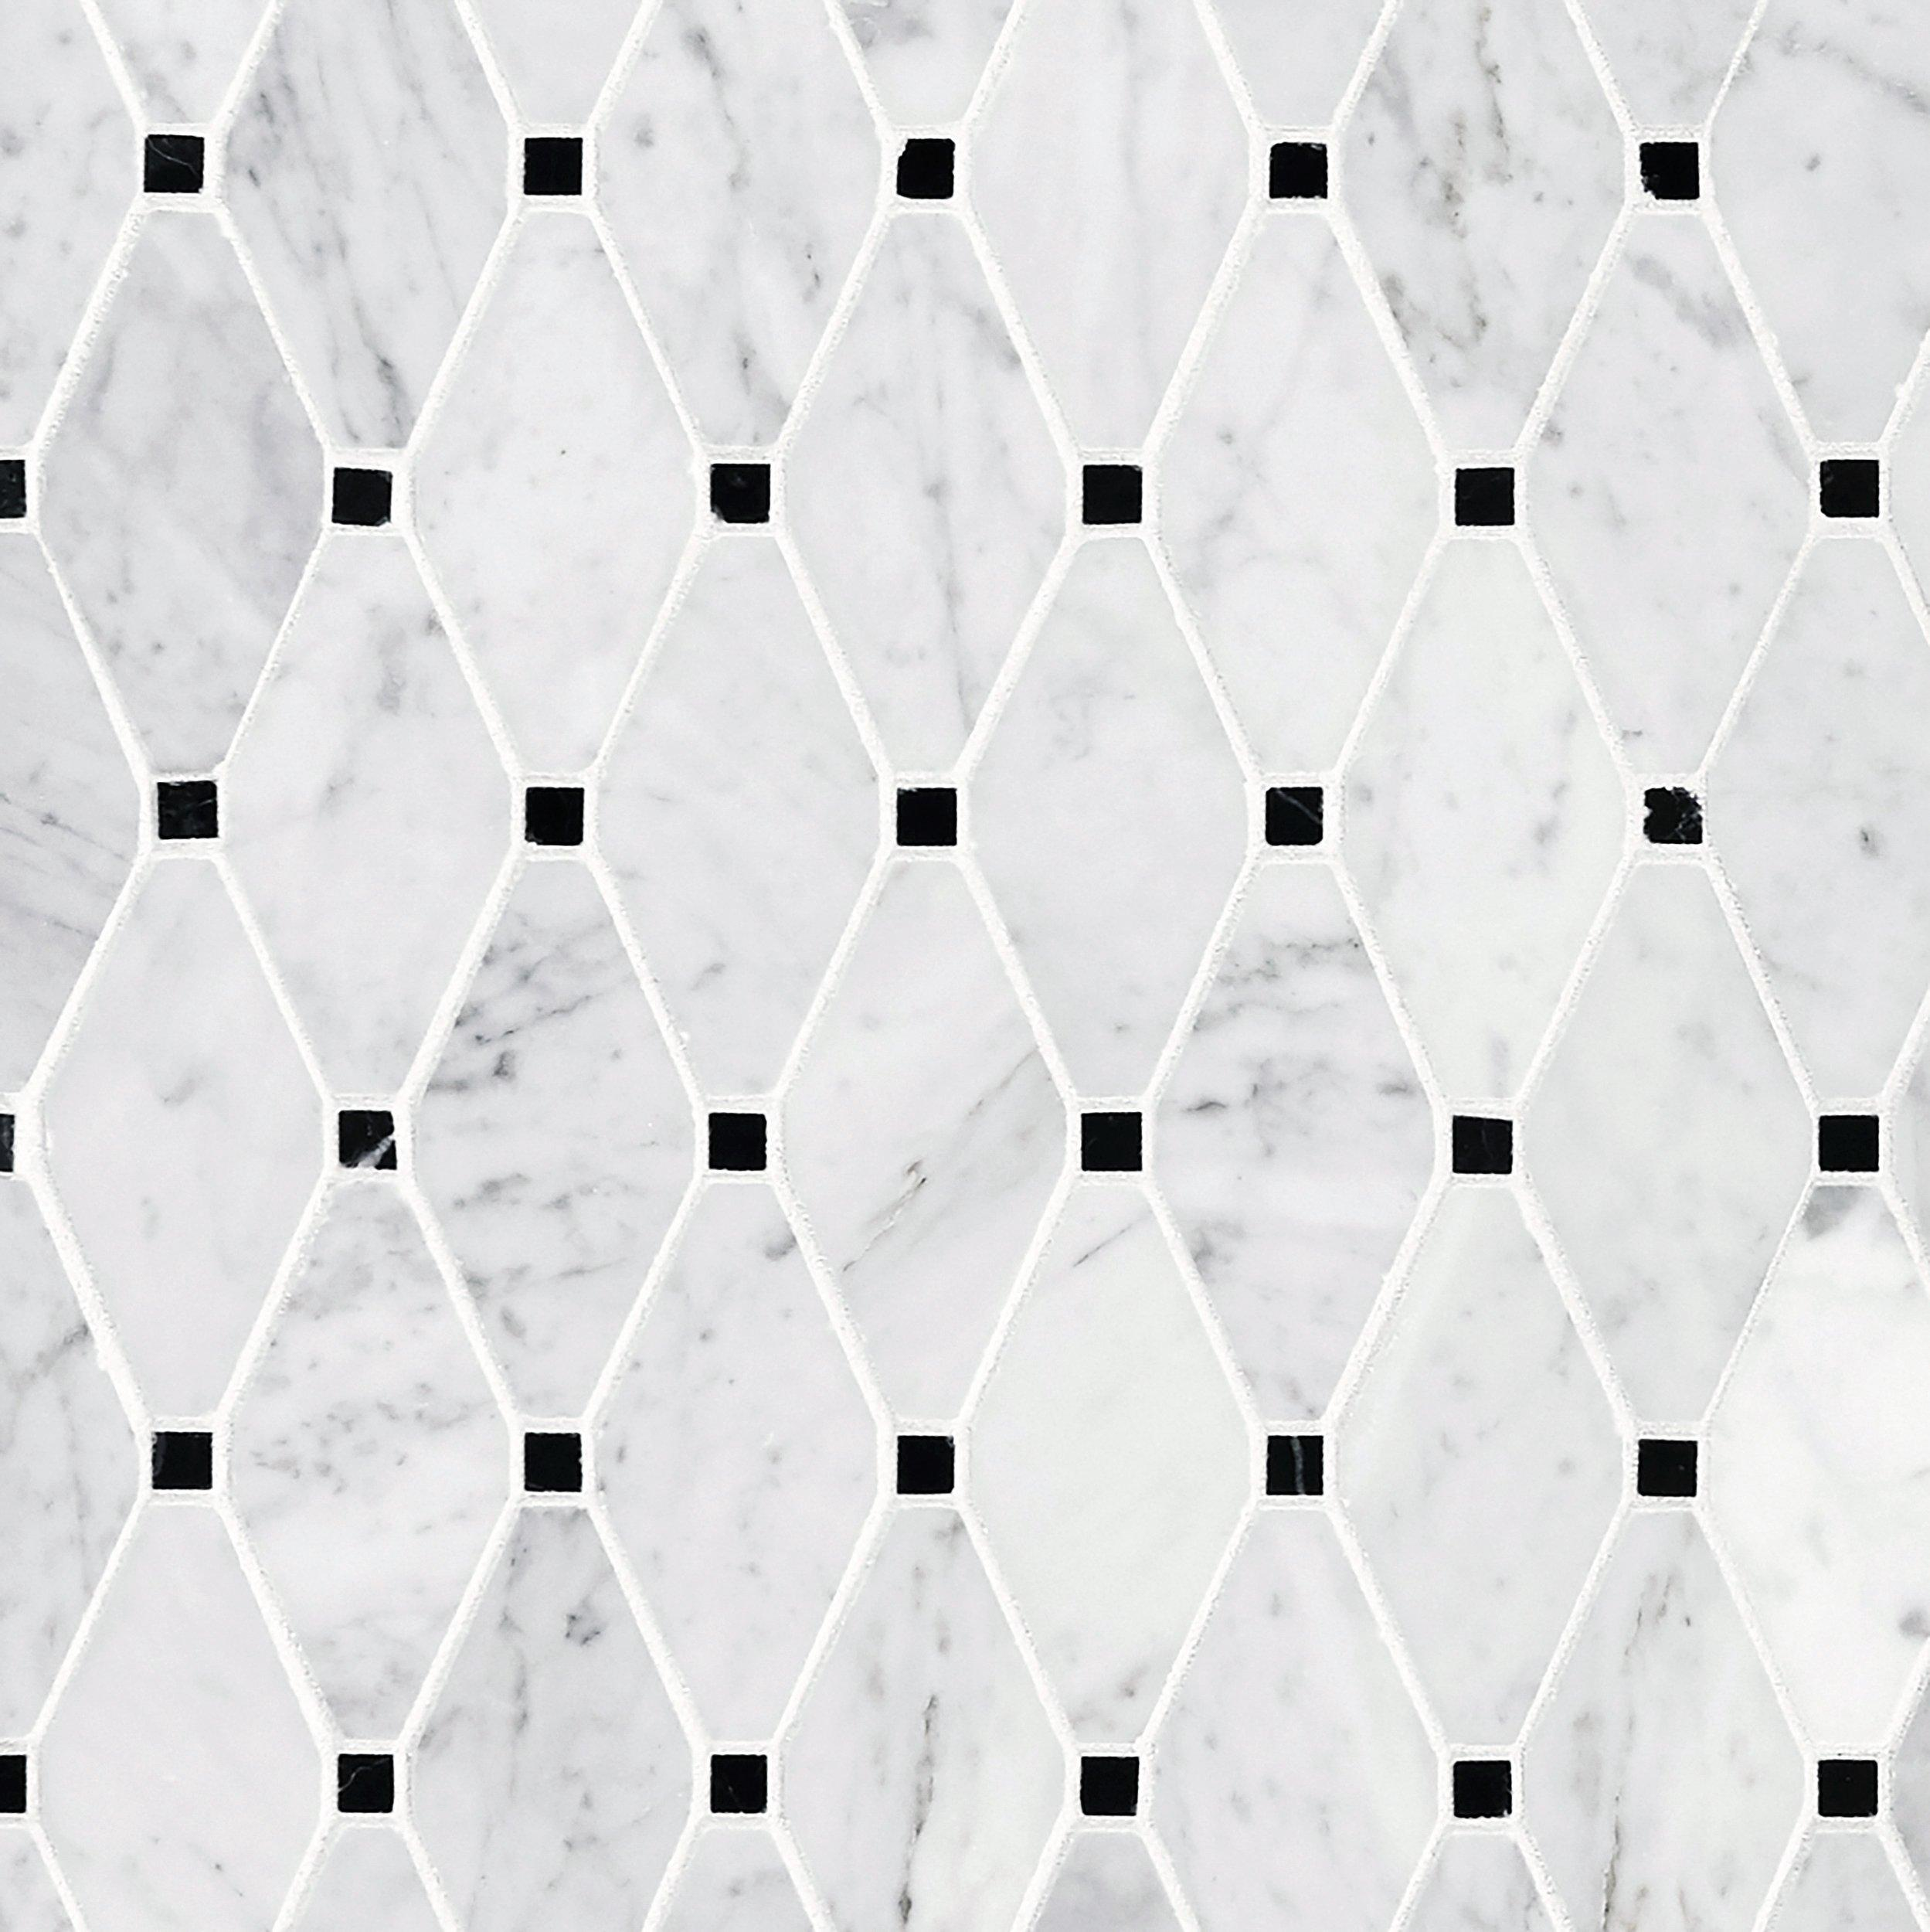 Carrara Clipped Diamond Polished Marble Mosaic 12 X 12